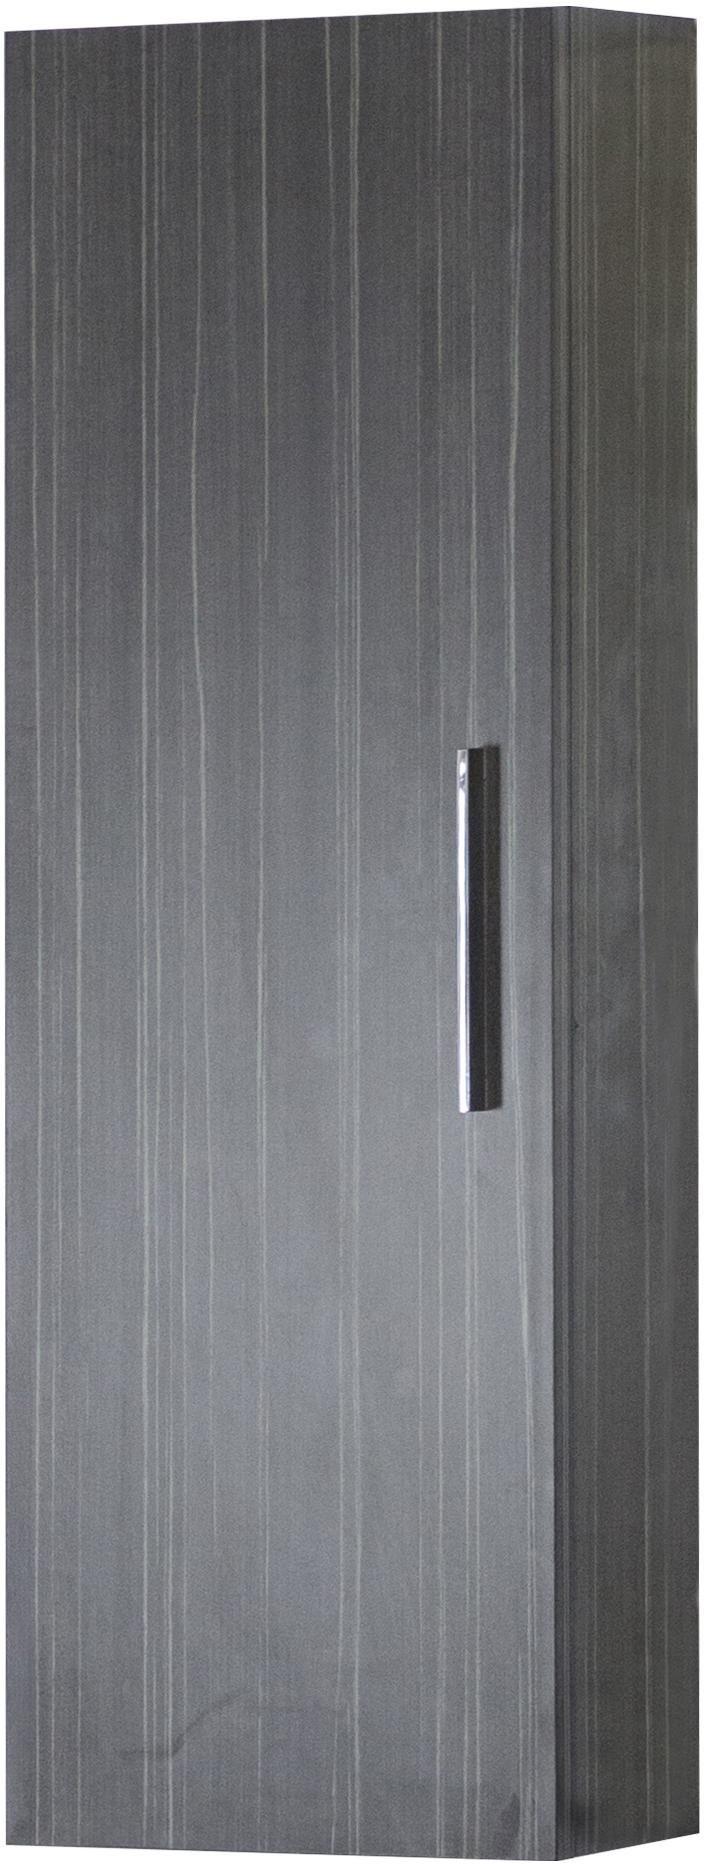 American Imagination AI-1405 Modern Plywood Single Door Dawn Grey Medicine Cabinet